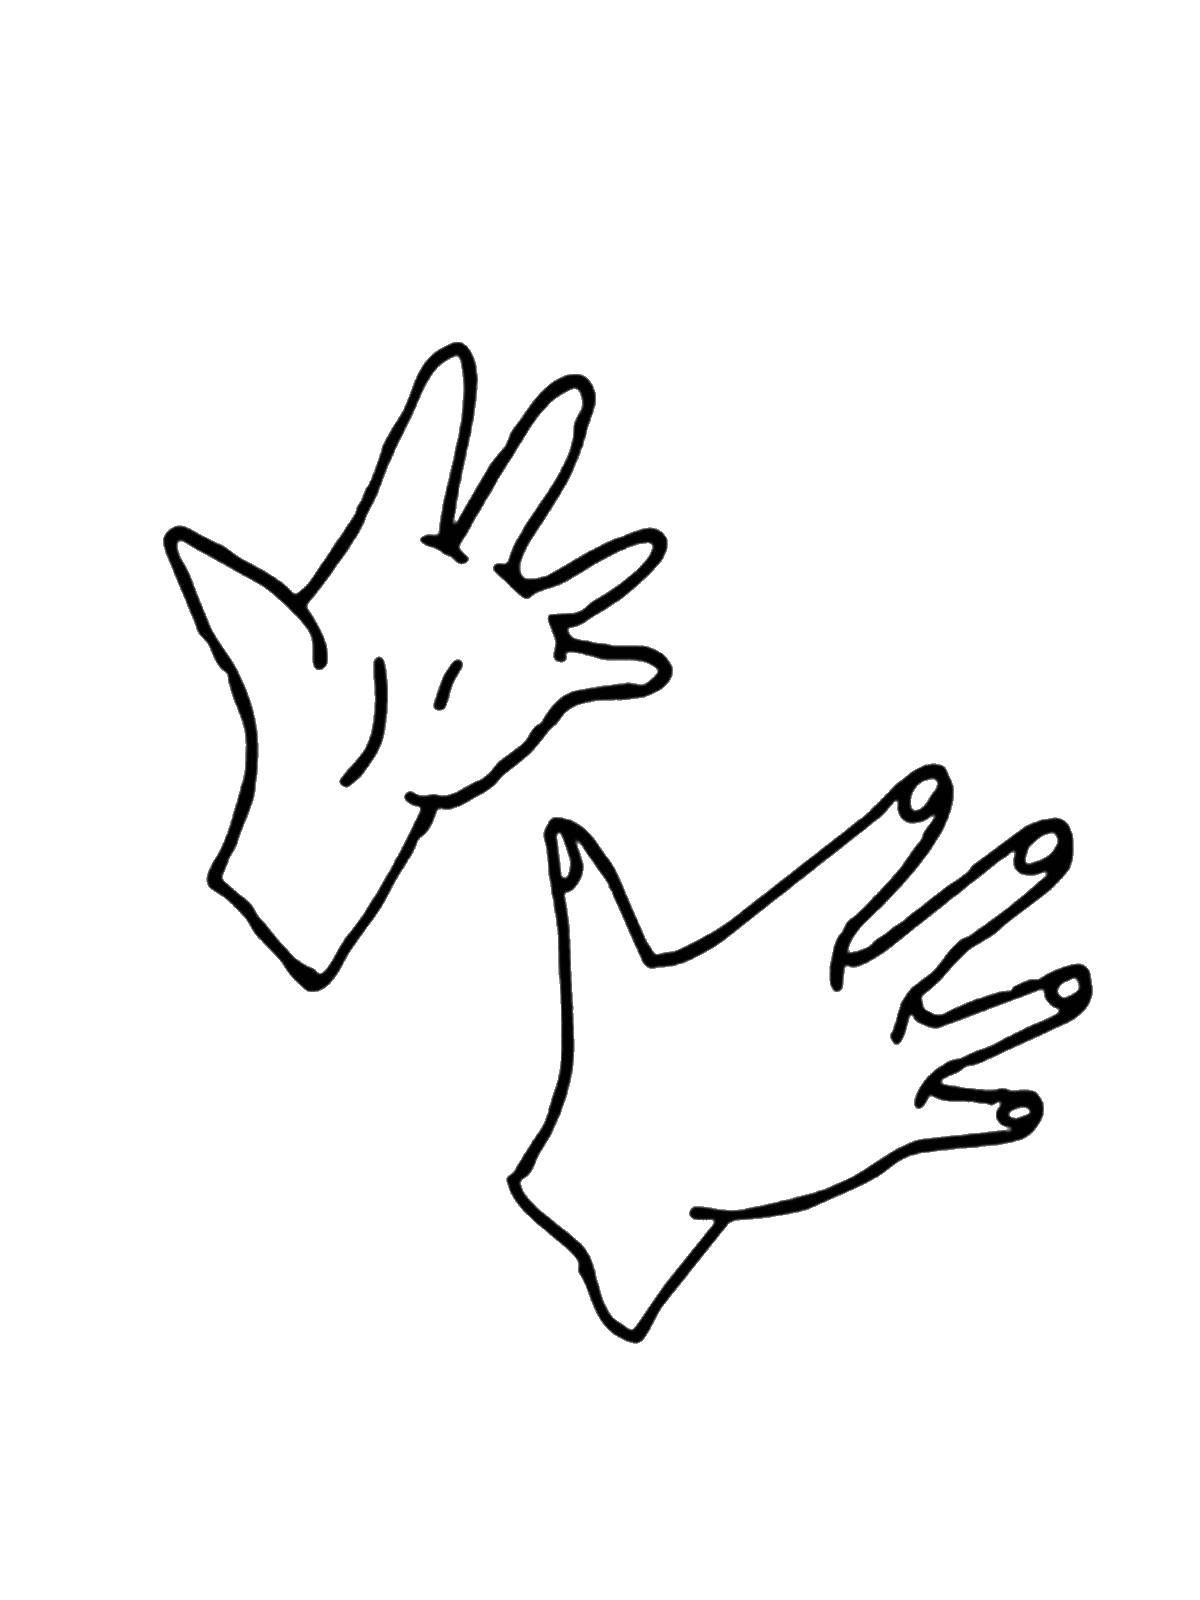 Картинки рук раскраска